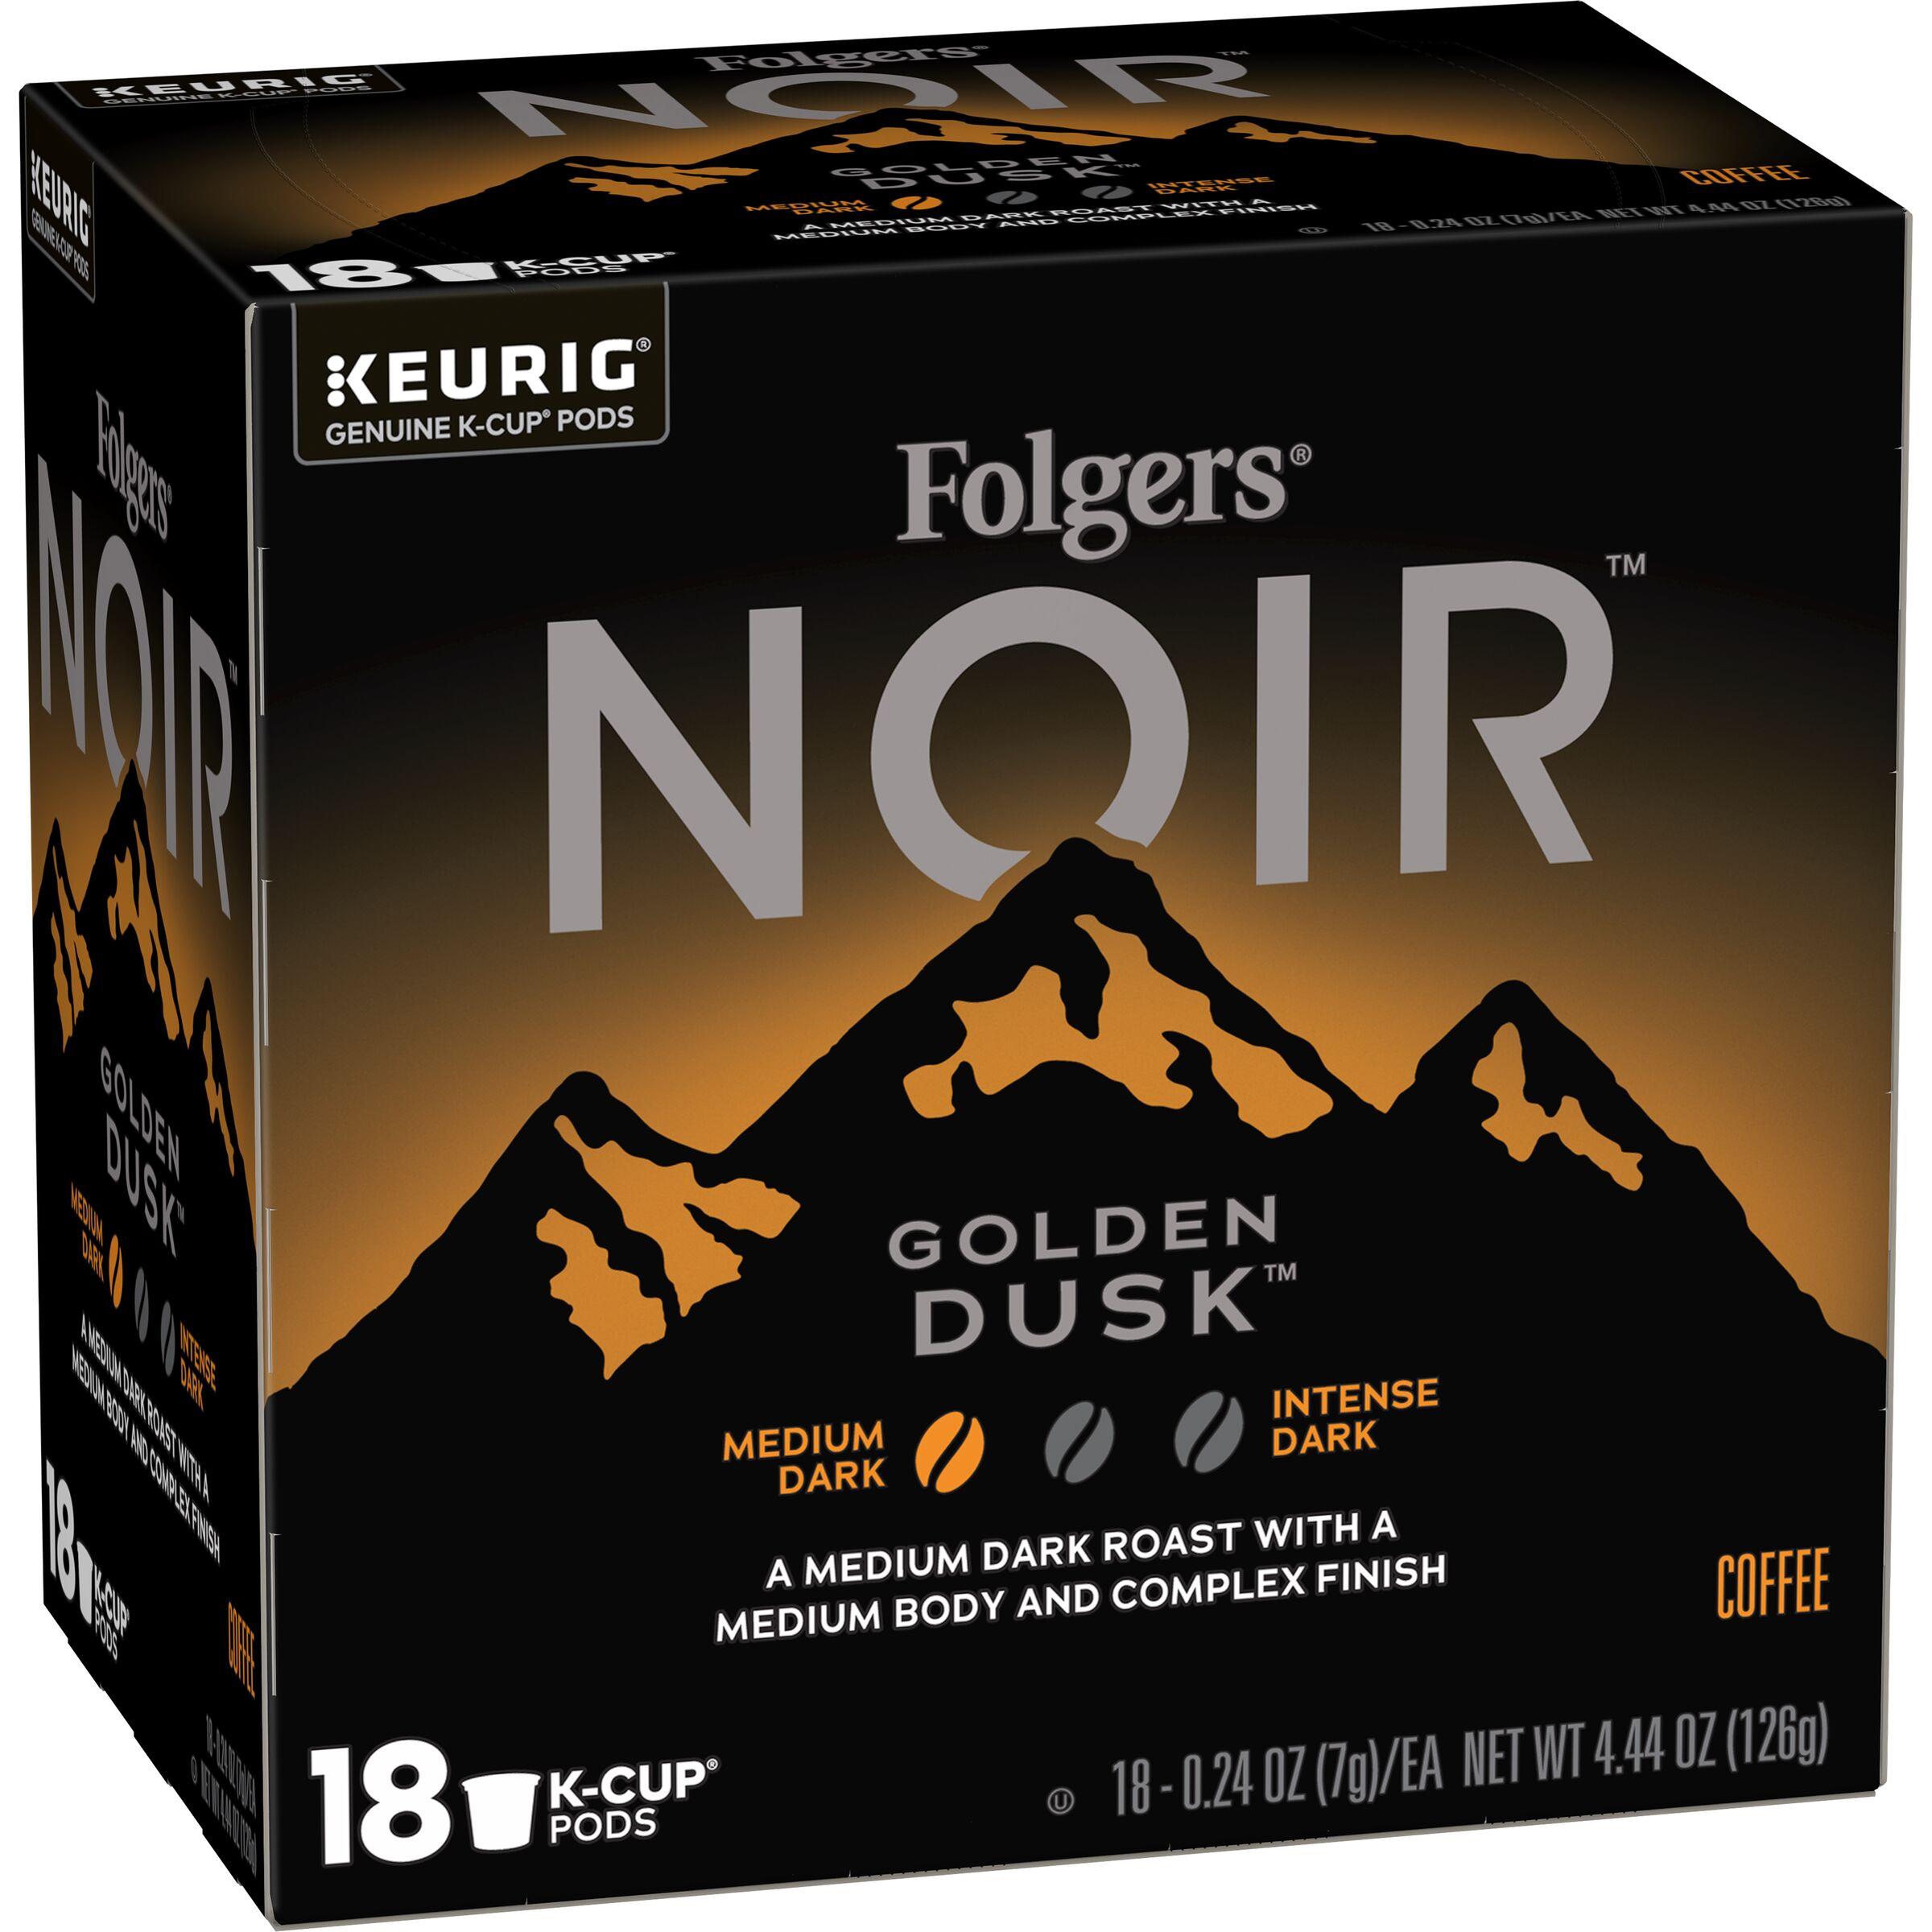 Folgers Noir Golden Dusk™ K-Cup® Pods